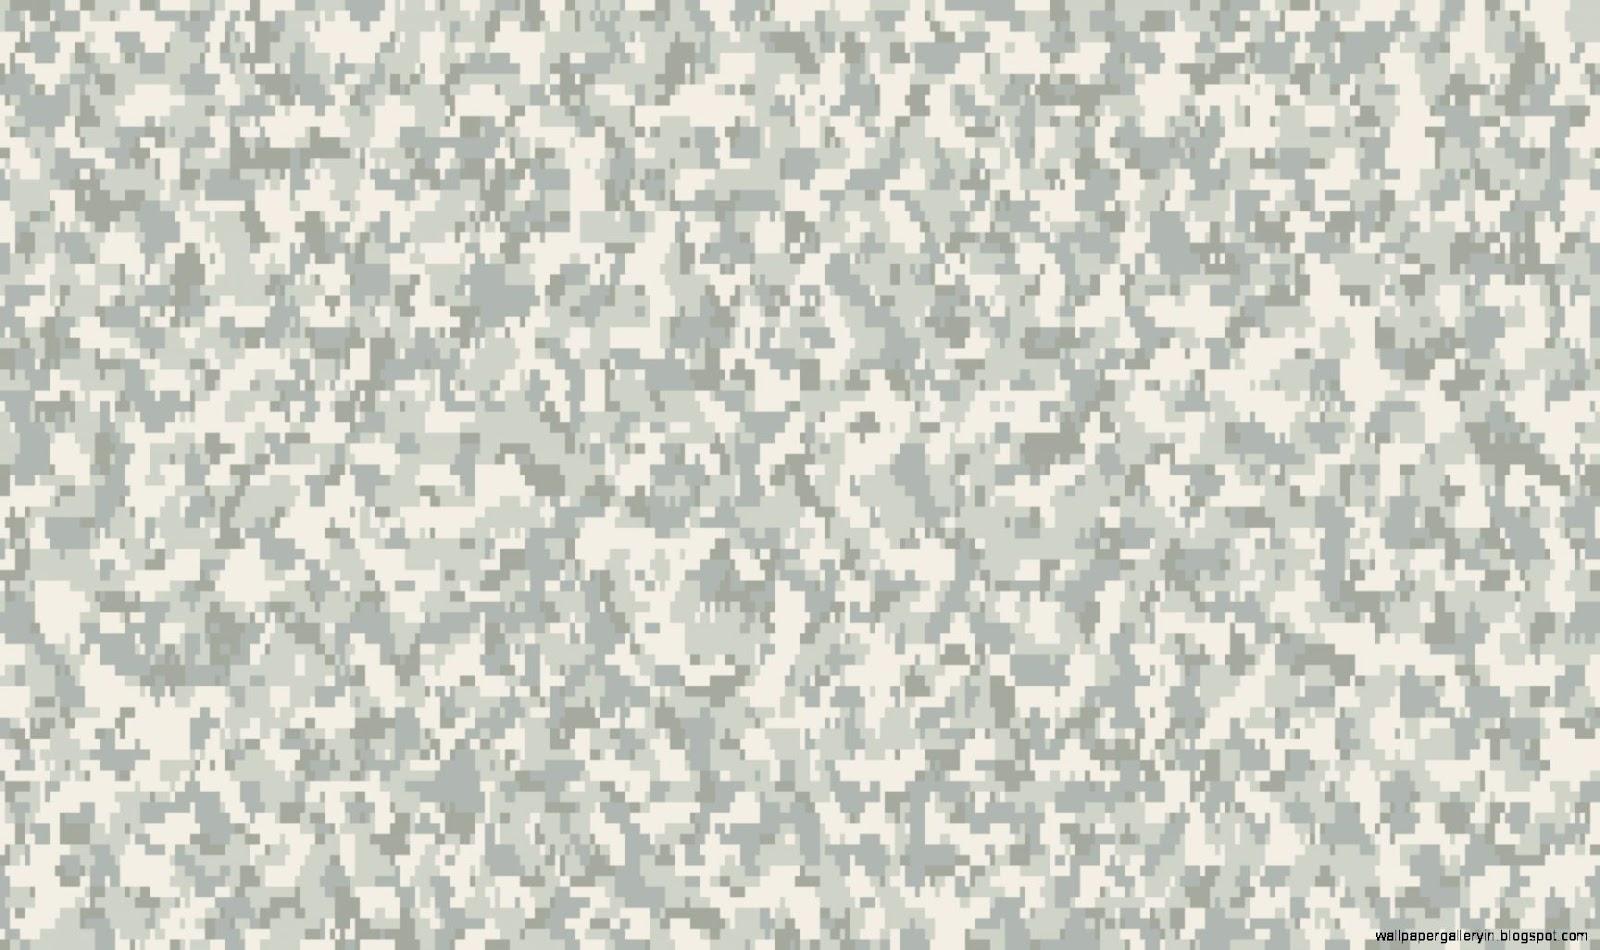 Army Digital Camouflage Hd Wallpaper